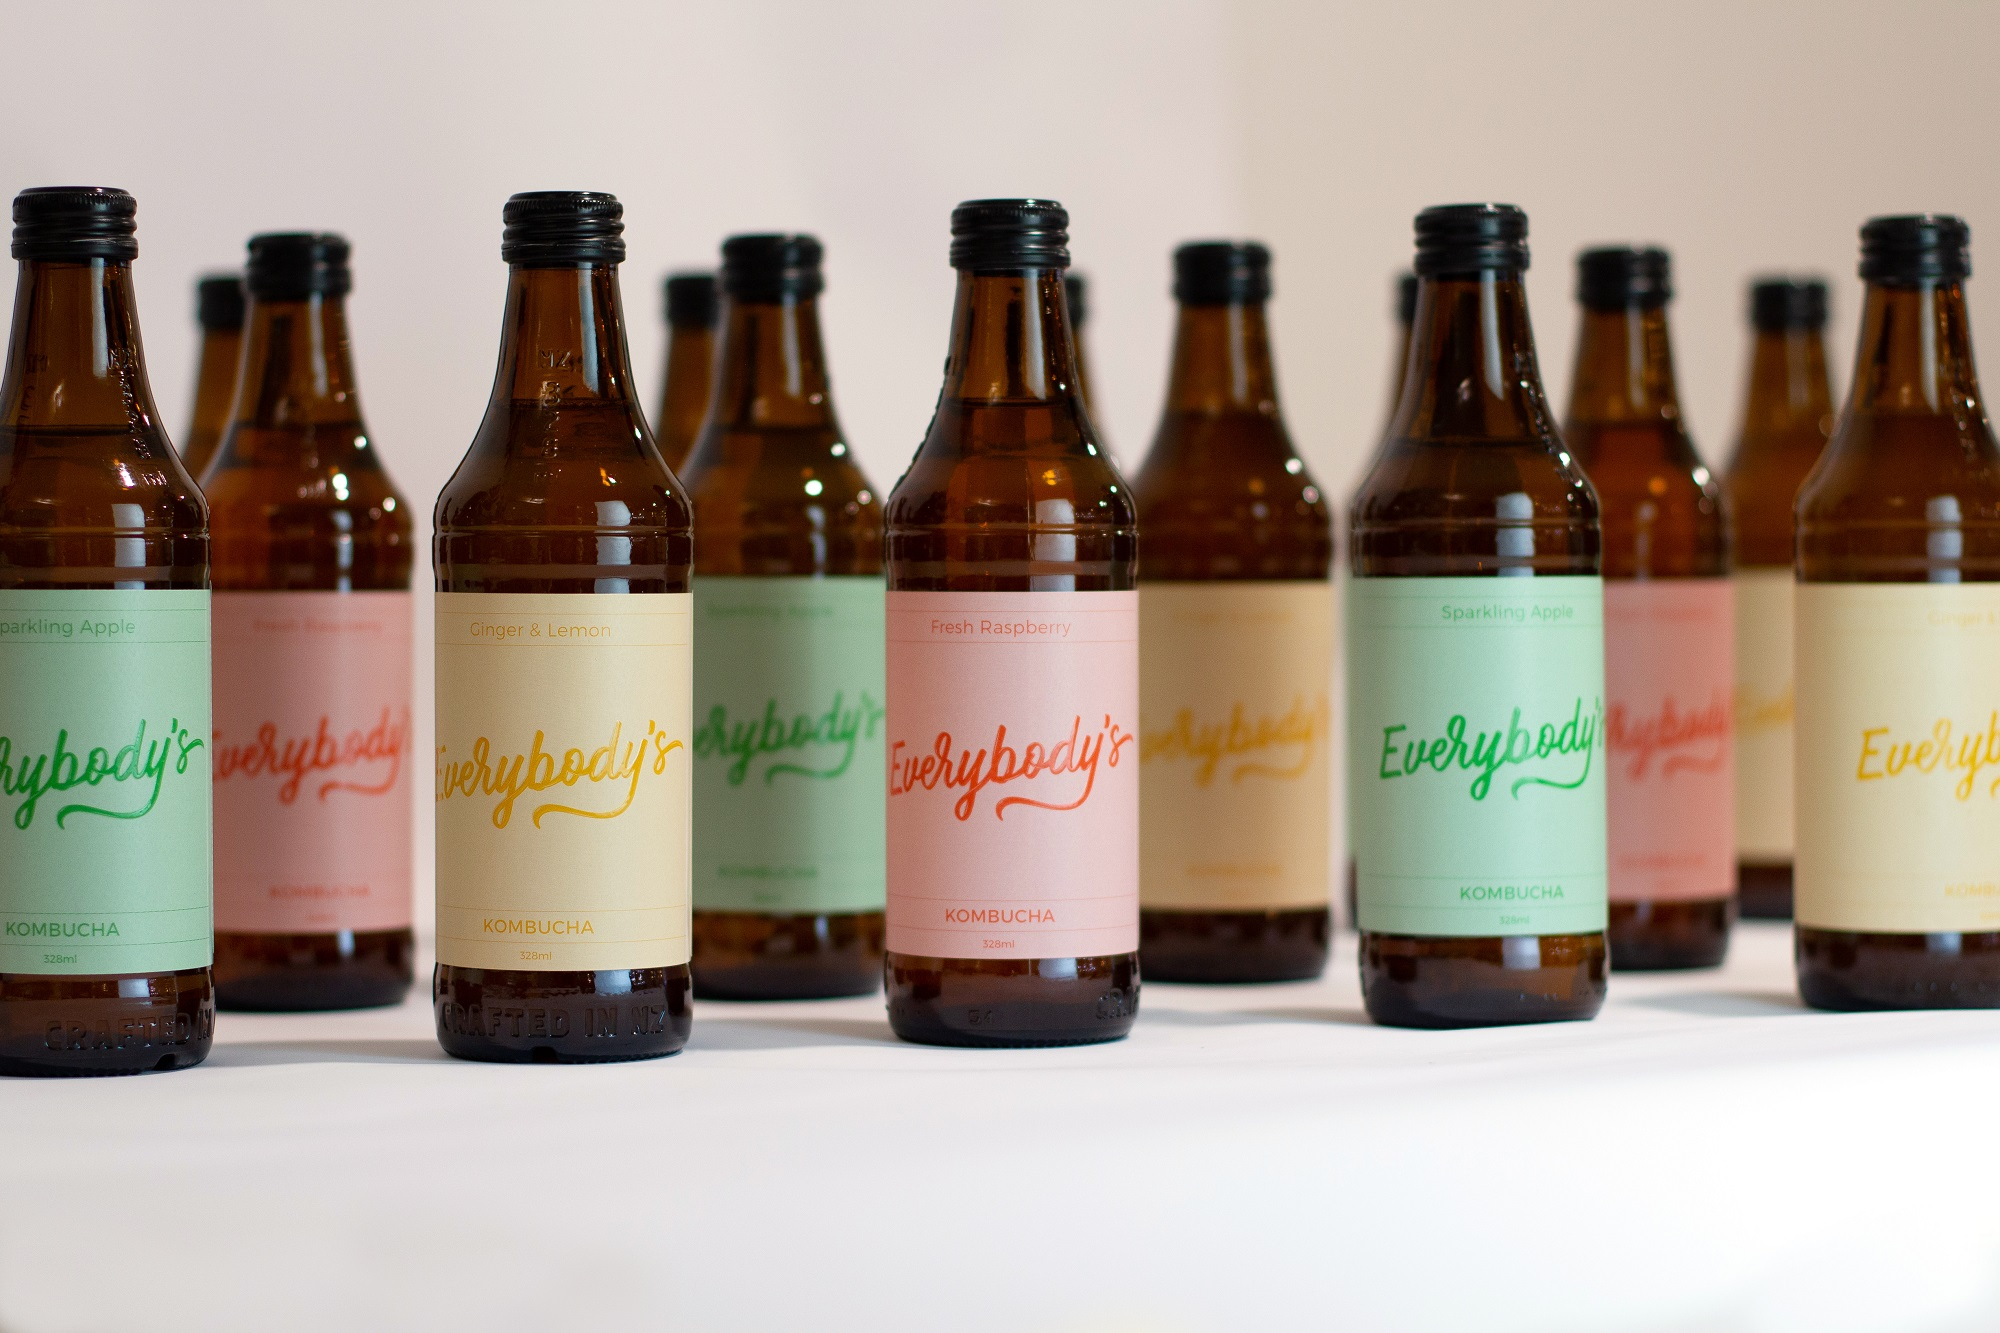 WAVE Creative Communications Agency creates branding for new drink Everybody's Kombucha